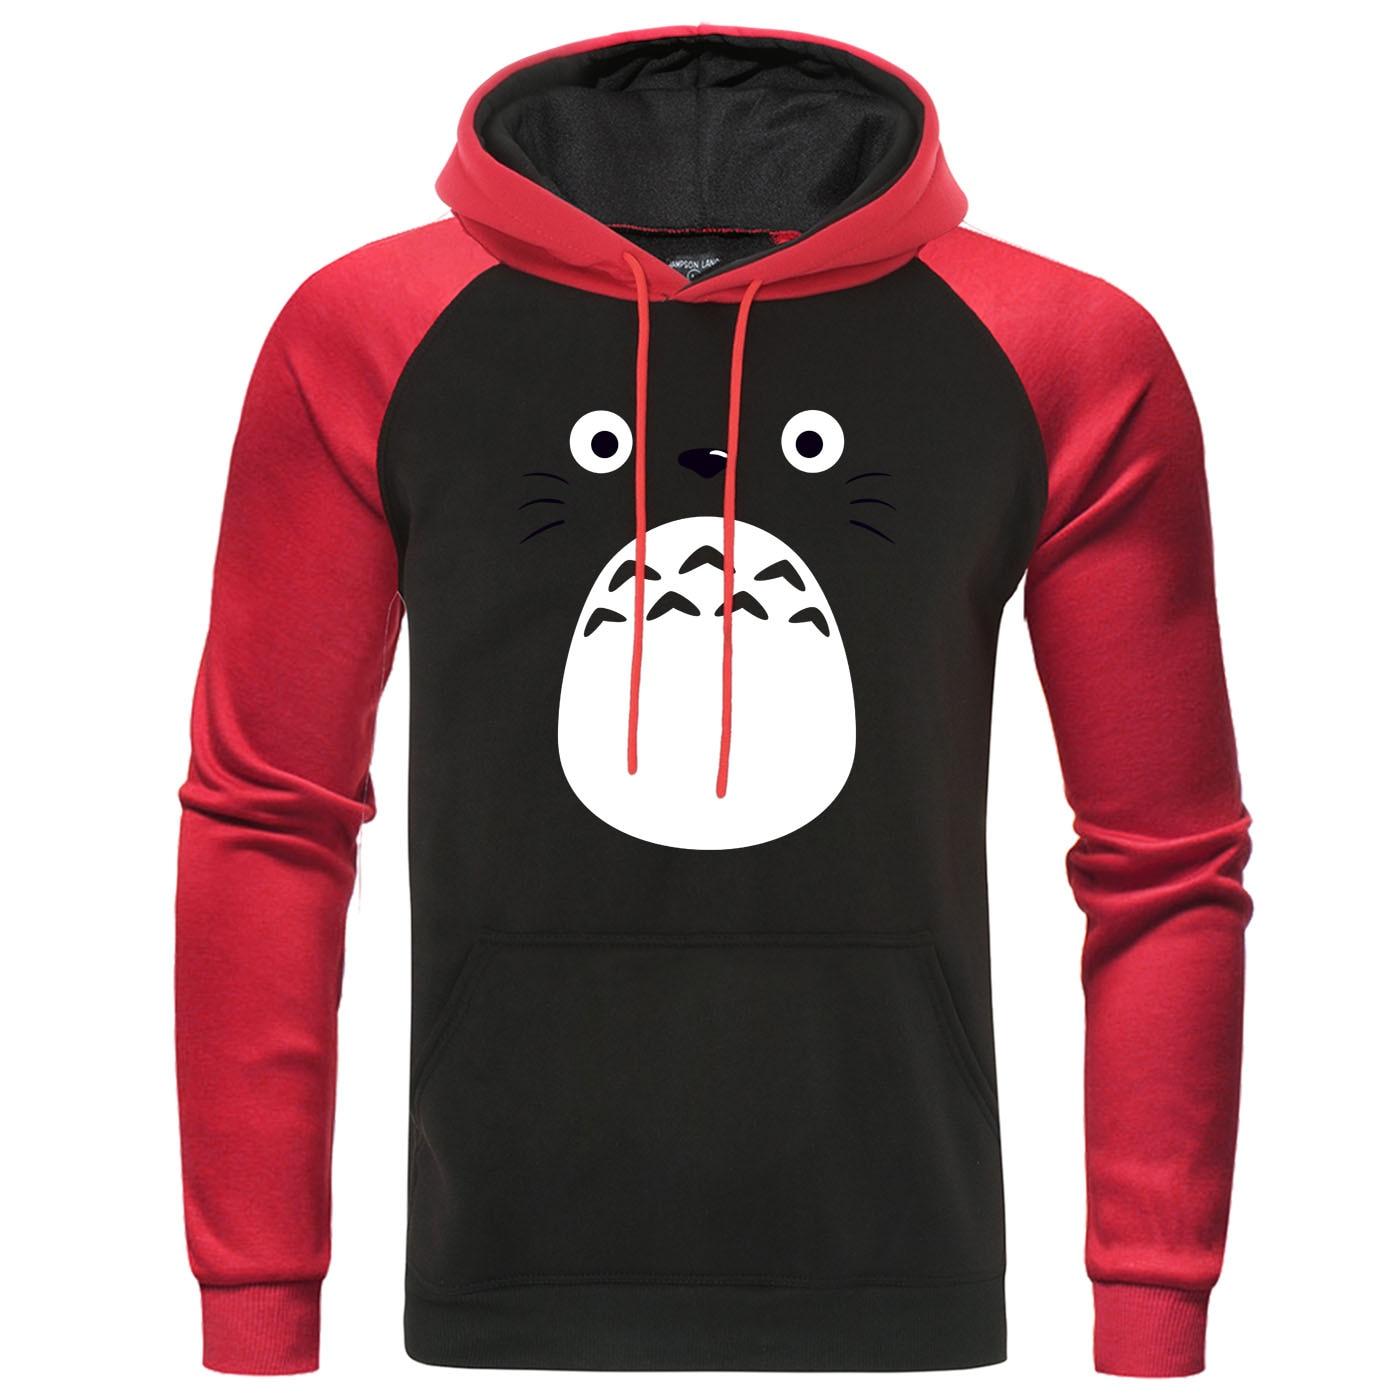 Homem raglan hoodies miyazaki hayao roupas dos desenhos animados anime japonês spirited away pullover studio ghibli moletom com capuz